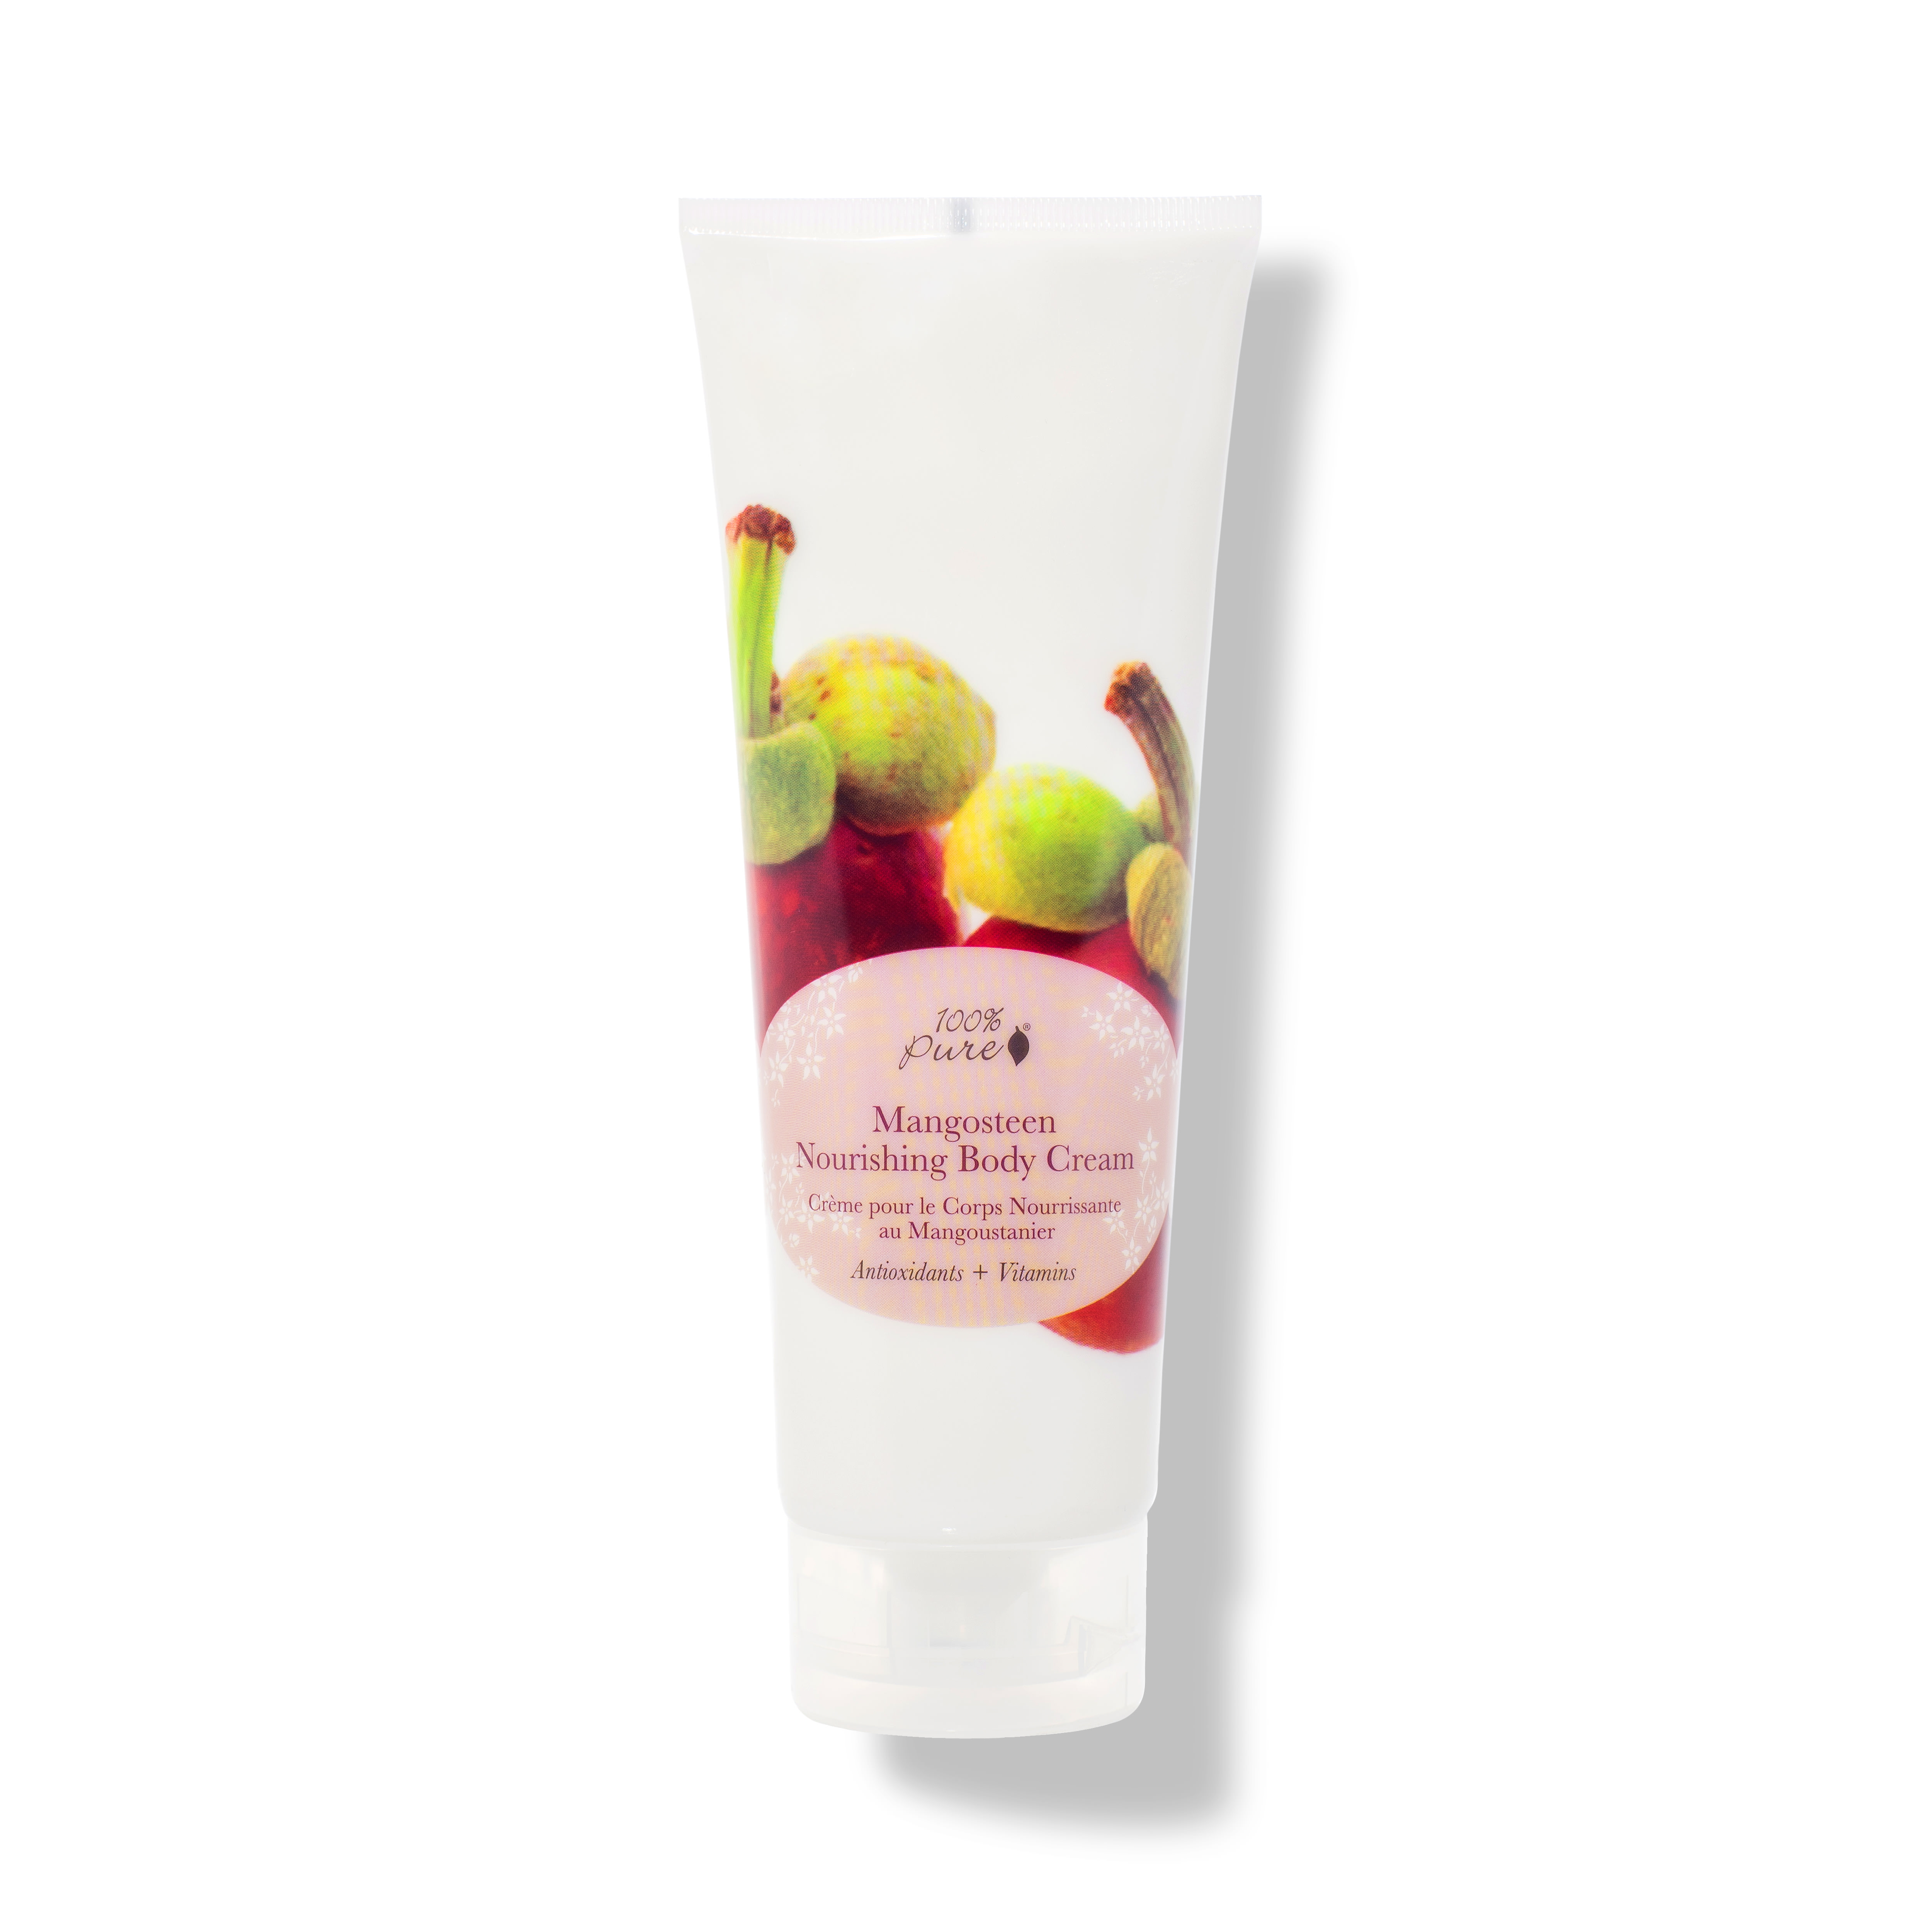 Product Grid - Mangosteen Nourishing Body Cream